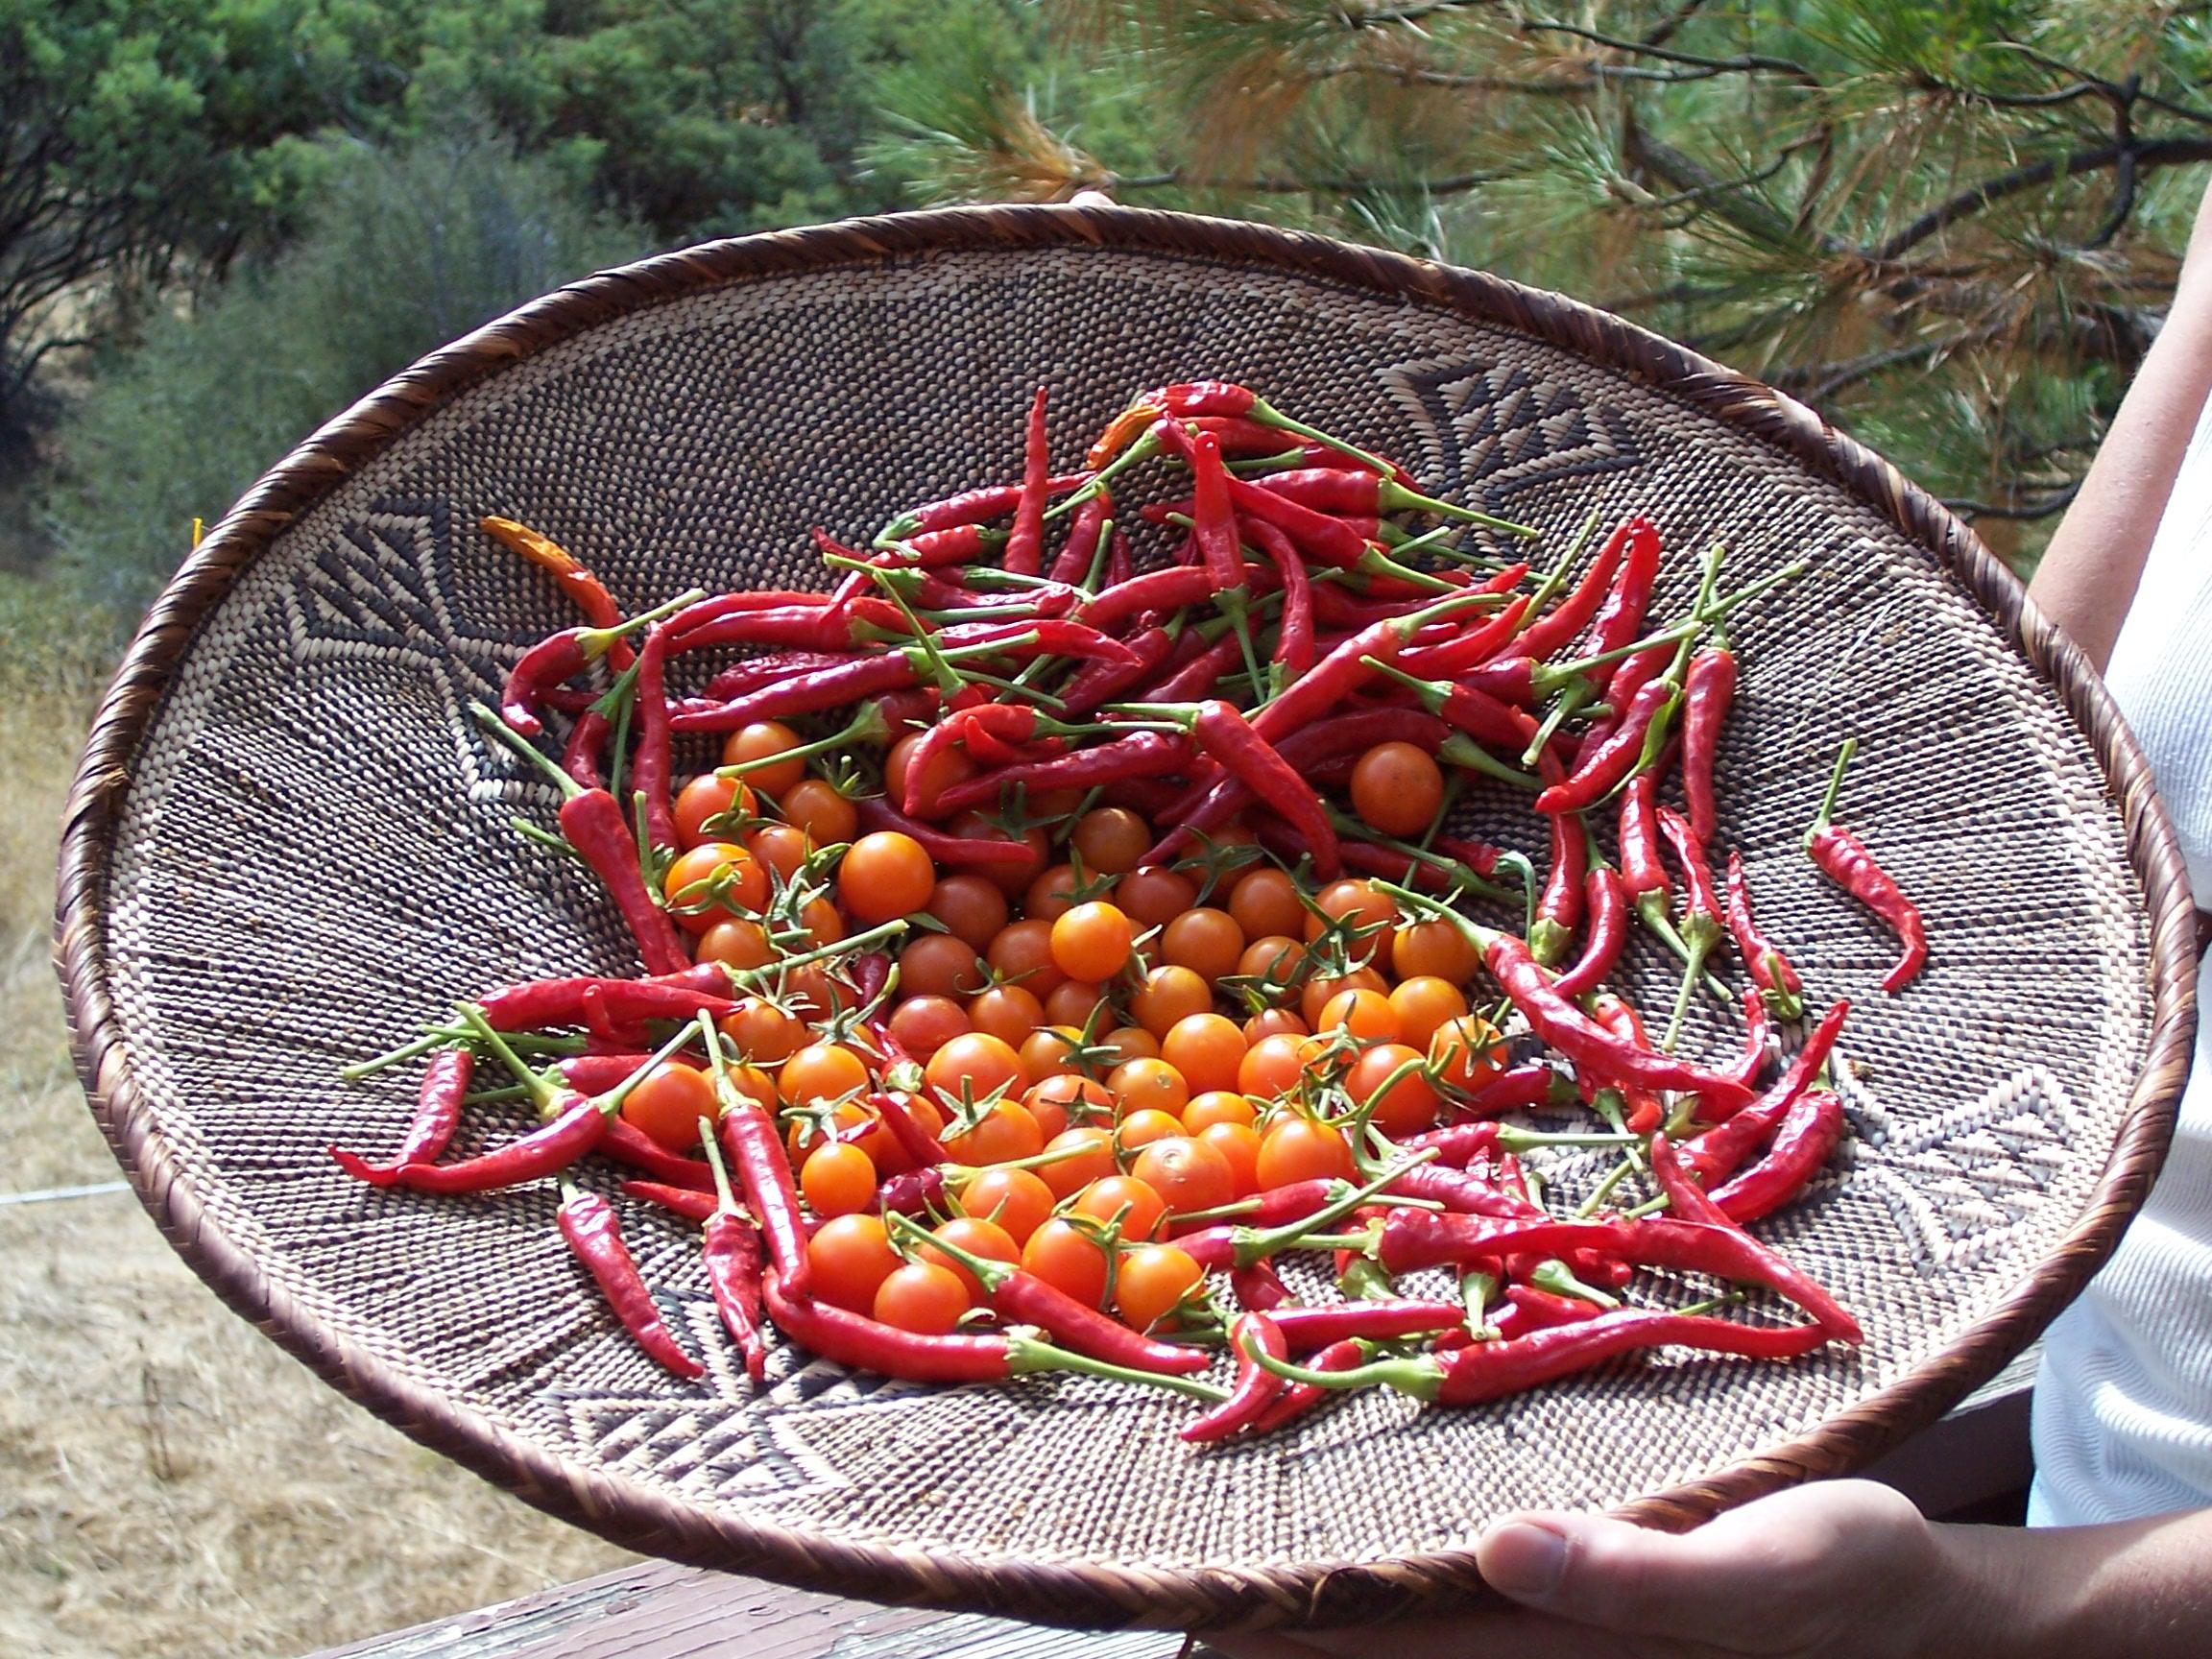 Chilis_Tomatoes